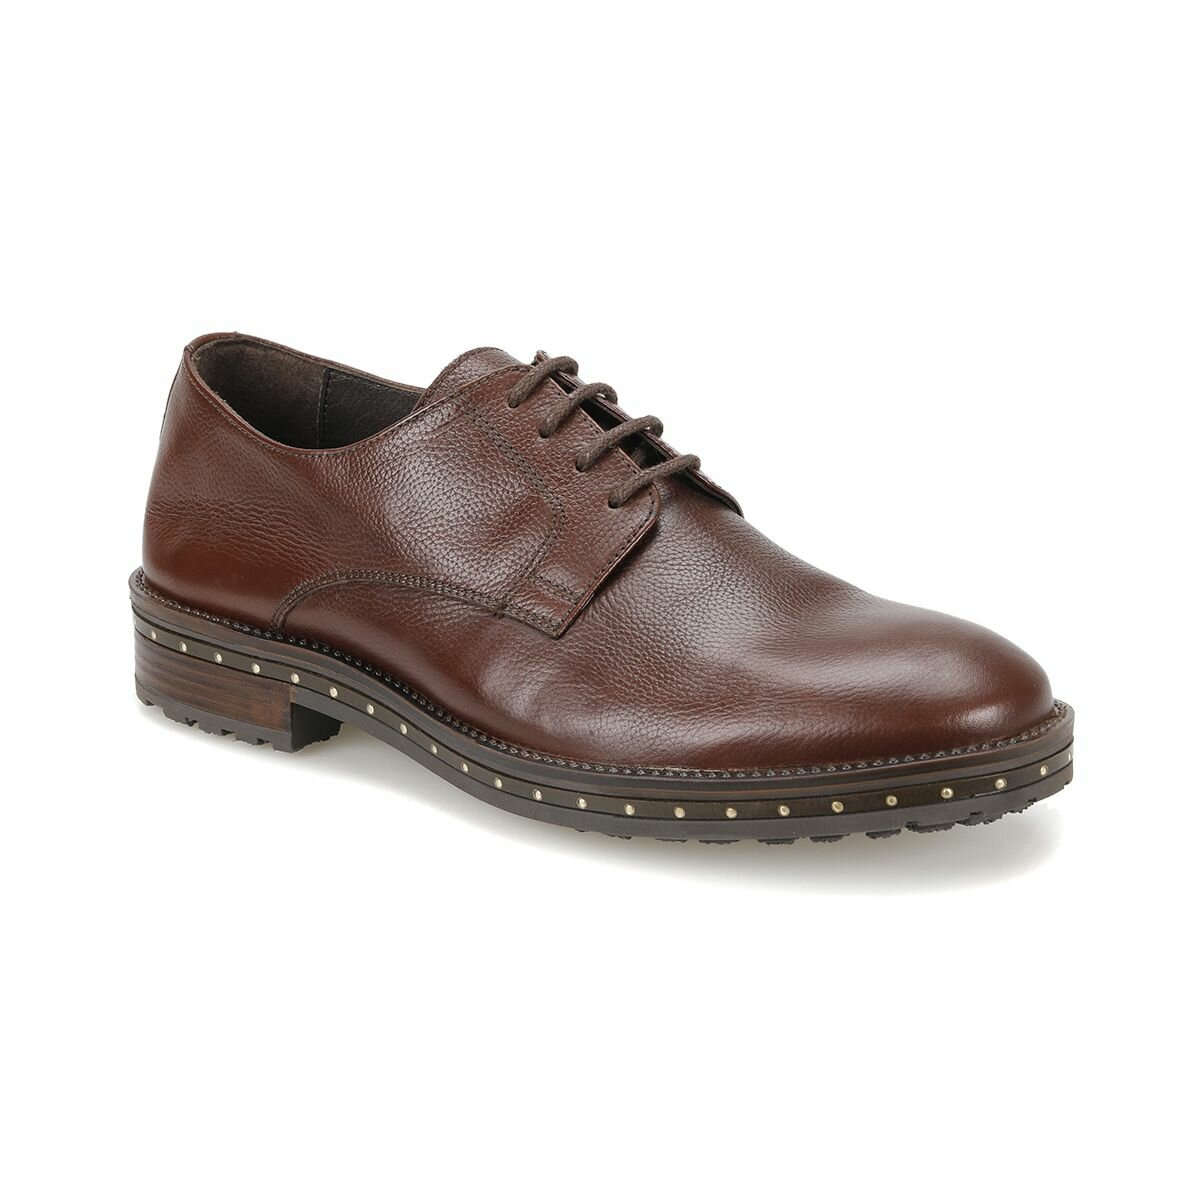 FLO 81031-1 Brown Men 'S Classic Shoes Garamond